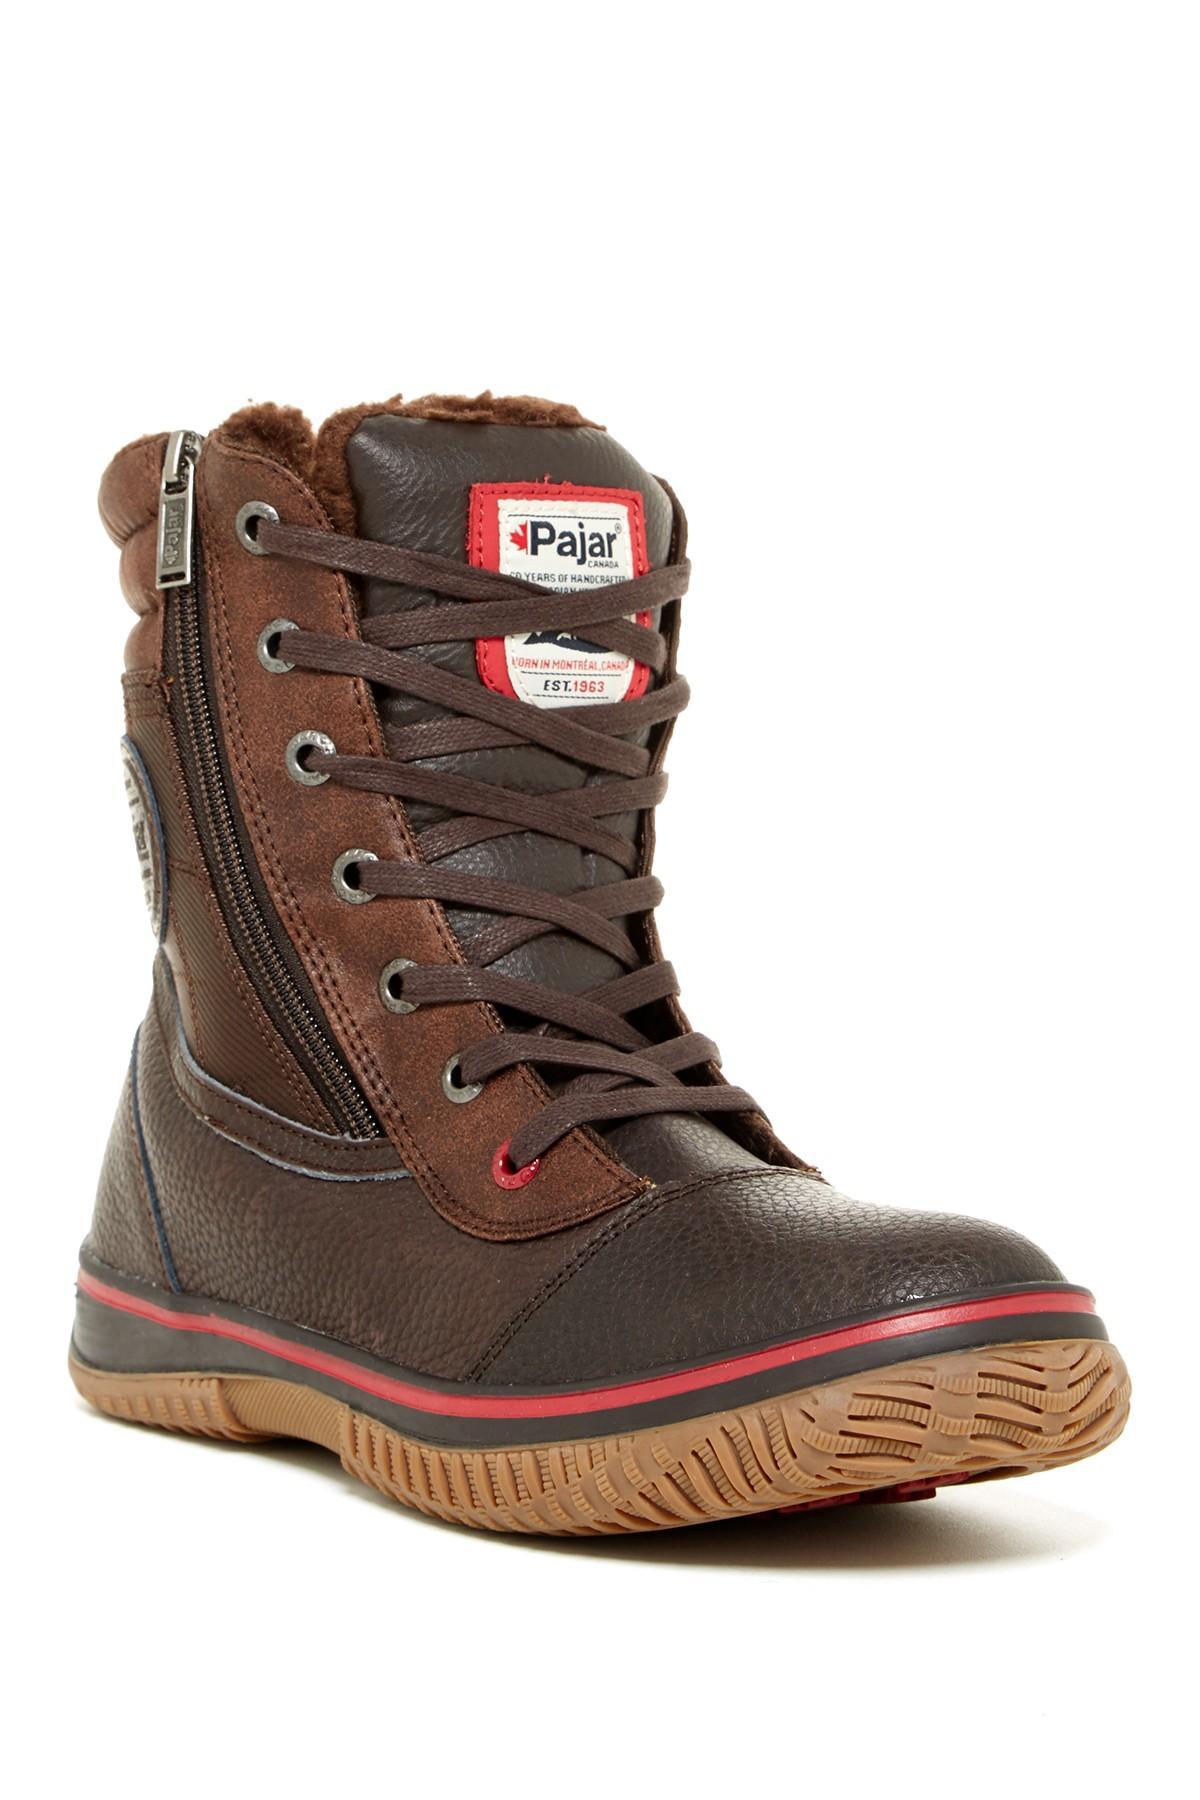 Pajar Boots Mount Mercy University